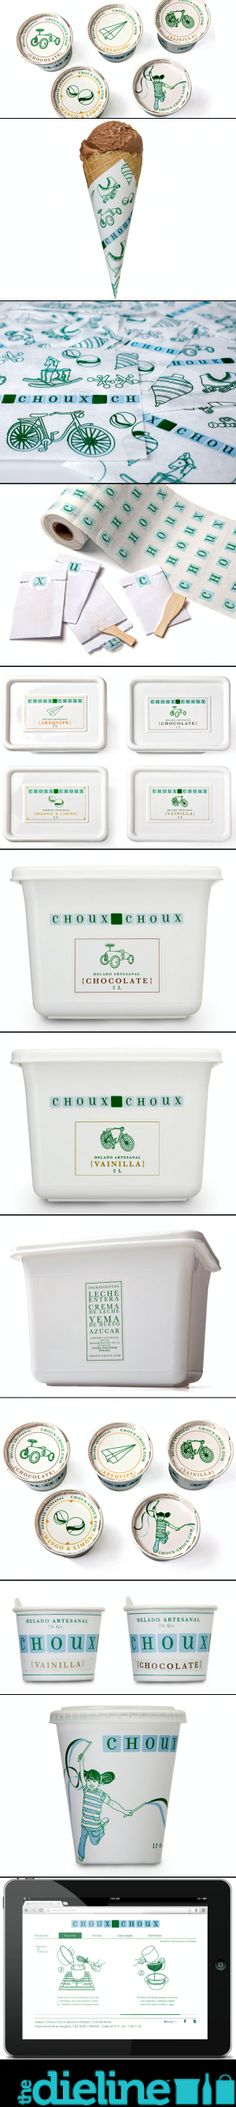 Choux Choux Gelato #identity #packaging #branding #marketing PD